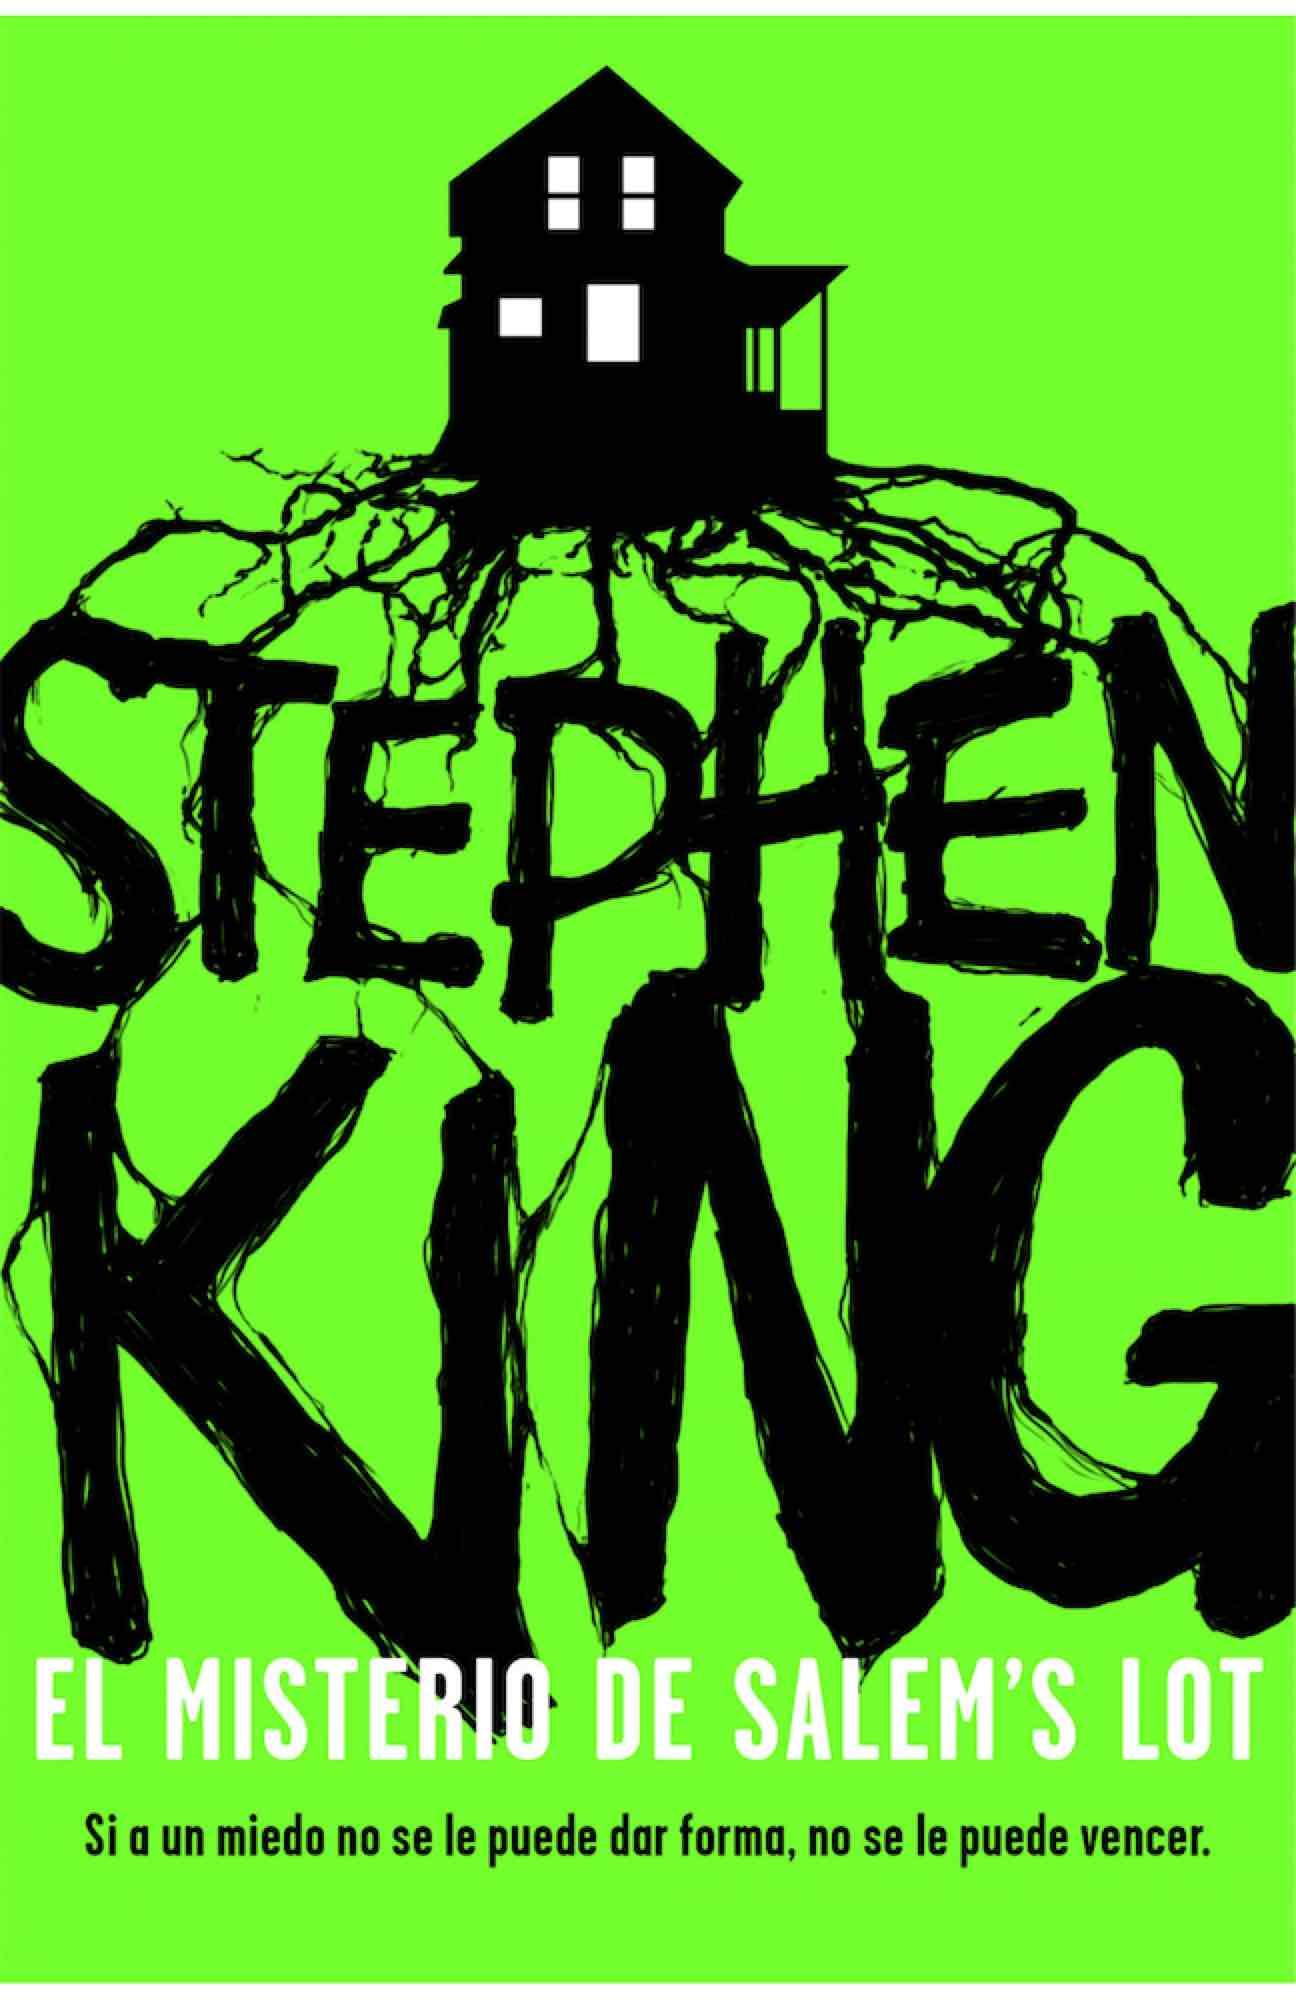 EL MISTERIO DE SALEM'S LOT (STEPHEN KING) (BOLSILLO)